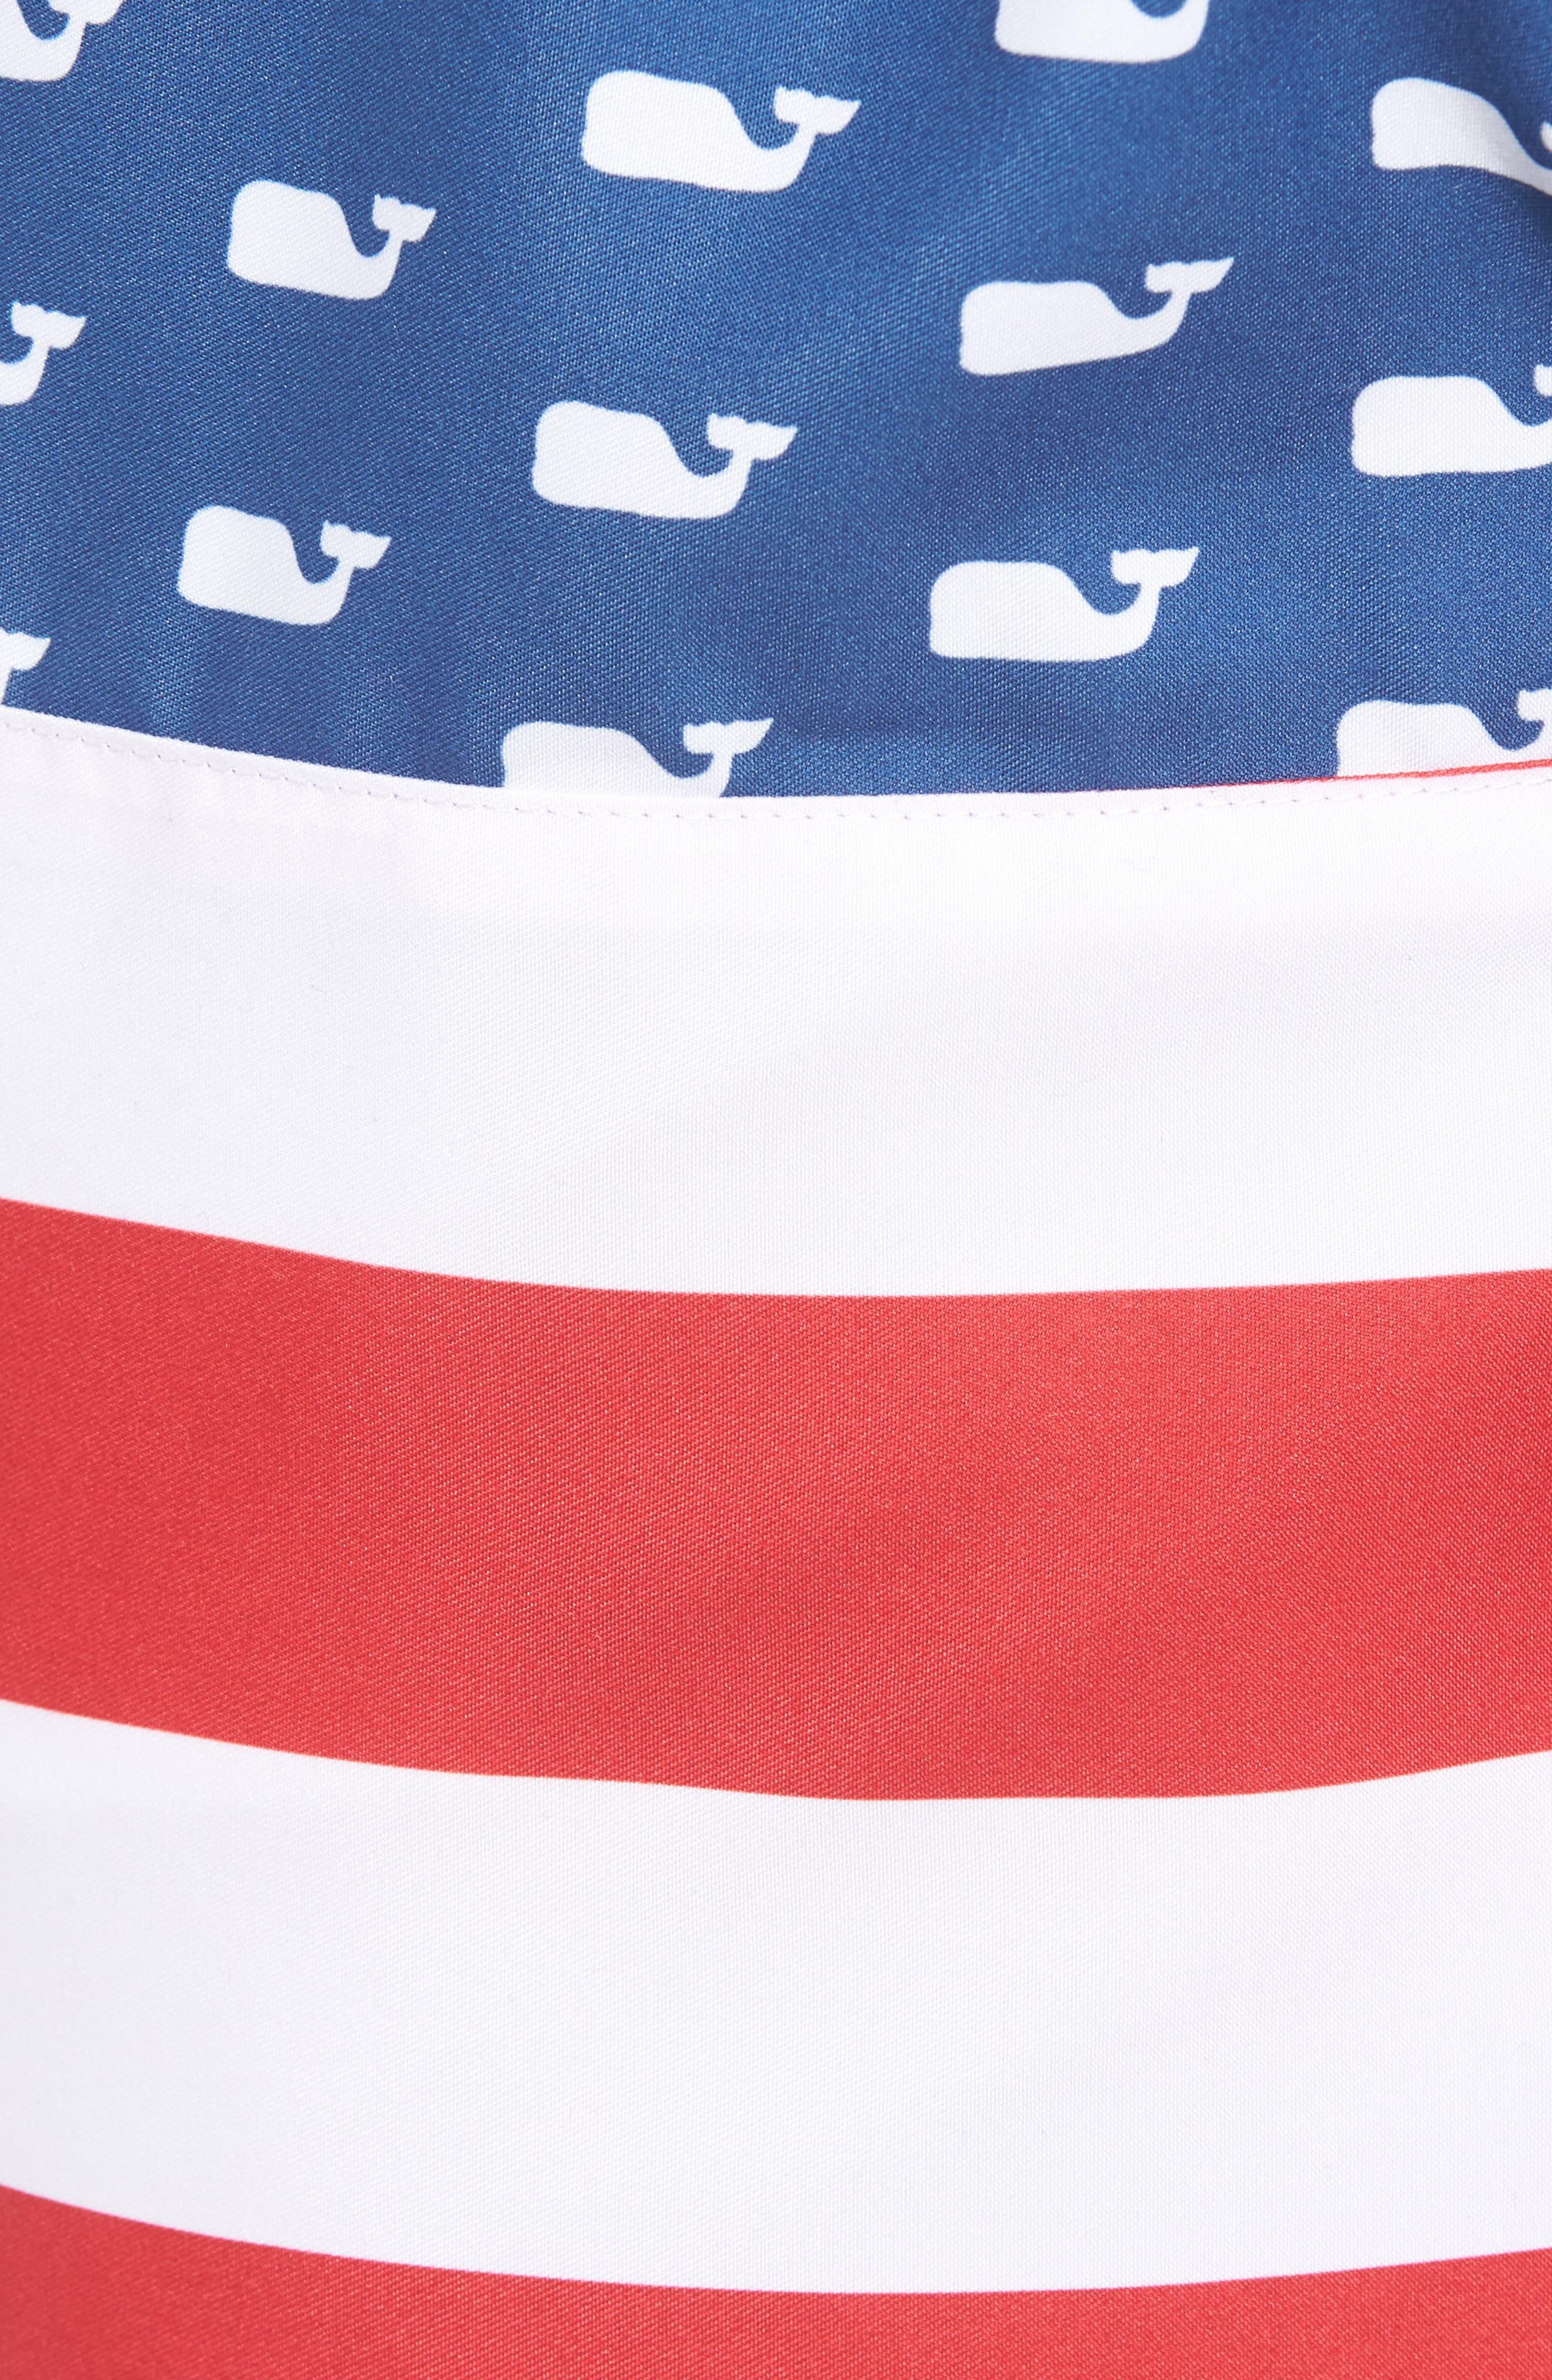 Chappy USA Flag Swim Trunks,                             Alternate thumbnail 5, color,                             461